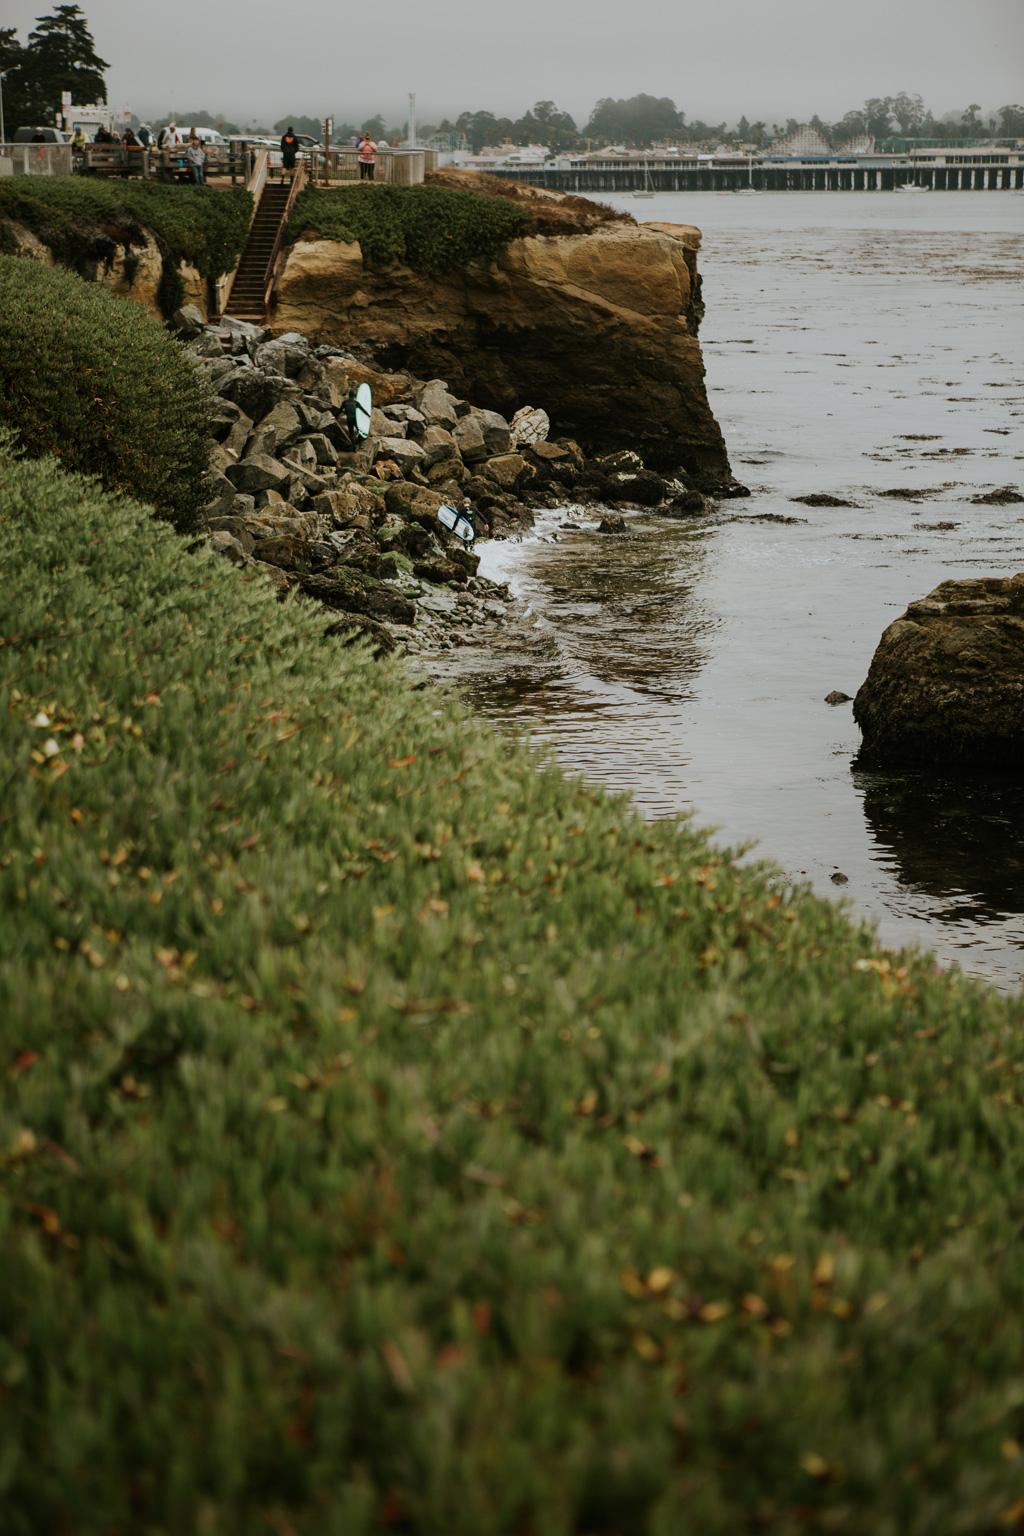 CindyGiovagnoli_SantCruz_SanJose_SanFrancisco_NelderGrove_sea_lions_boardwalk_hapas_brewery_sourdough_ocean_half_moon_bay_California-077.jpg